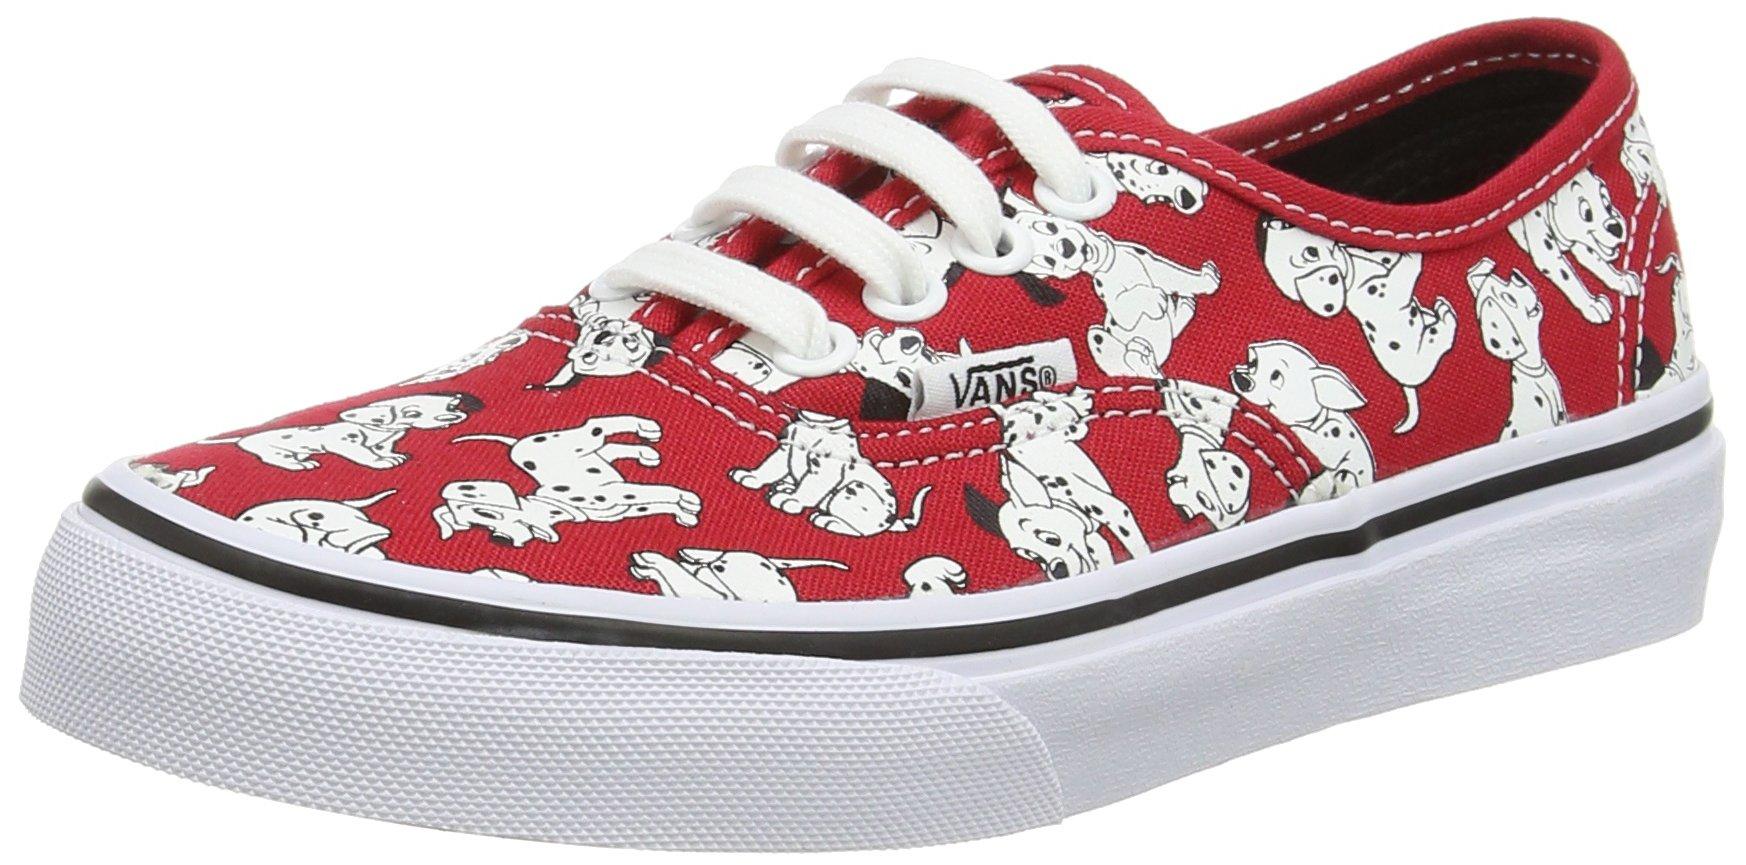 Vans Kids Disney Dalmatians/Red Skate Shoe - 11.5 M US Little Kid